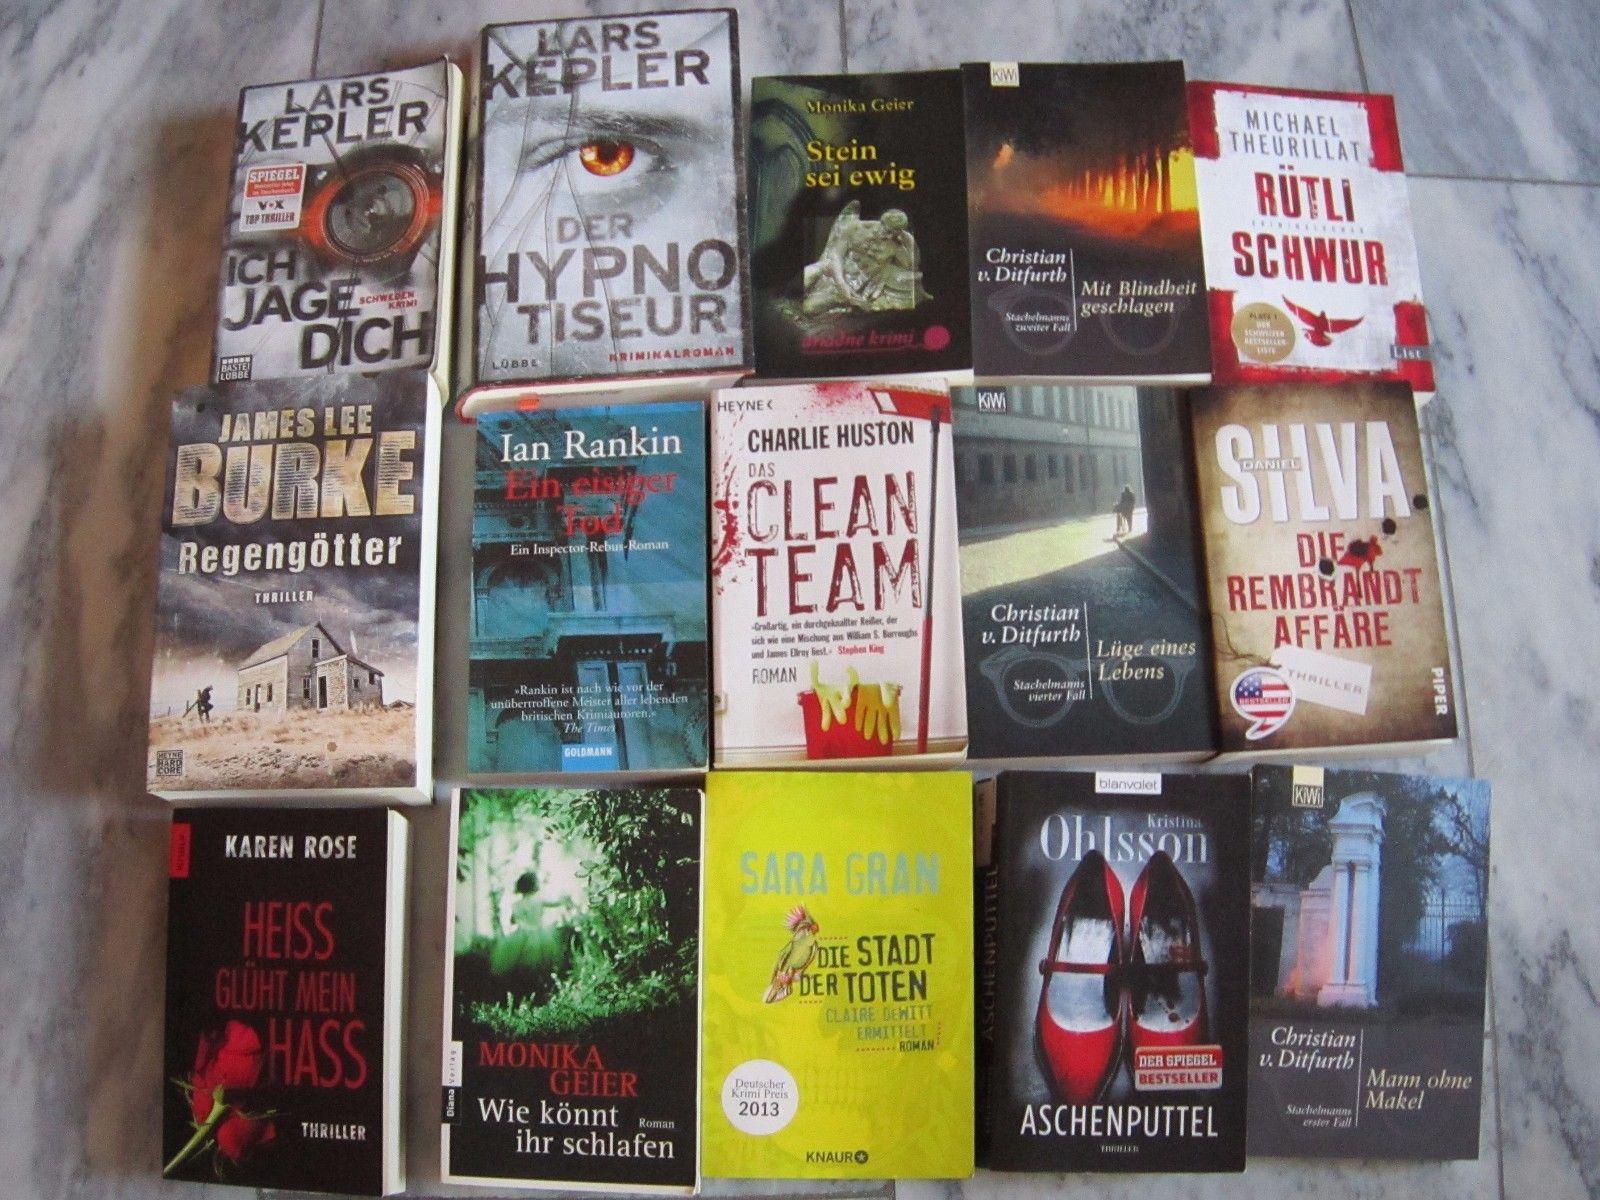 Buchpaket Bücherpaket Krimi Krimis, Thriller, Romane 14 Krimis